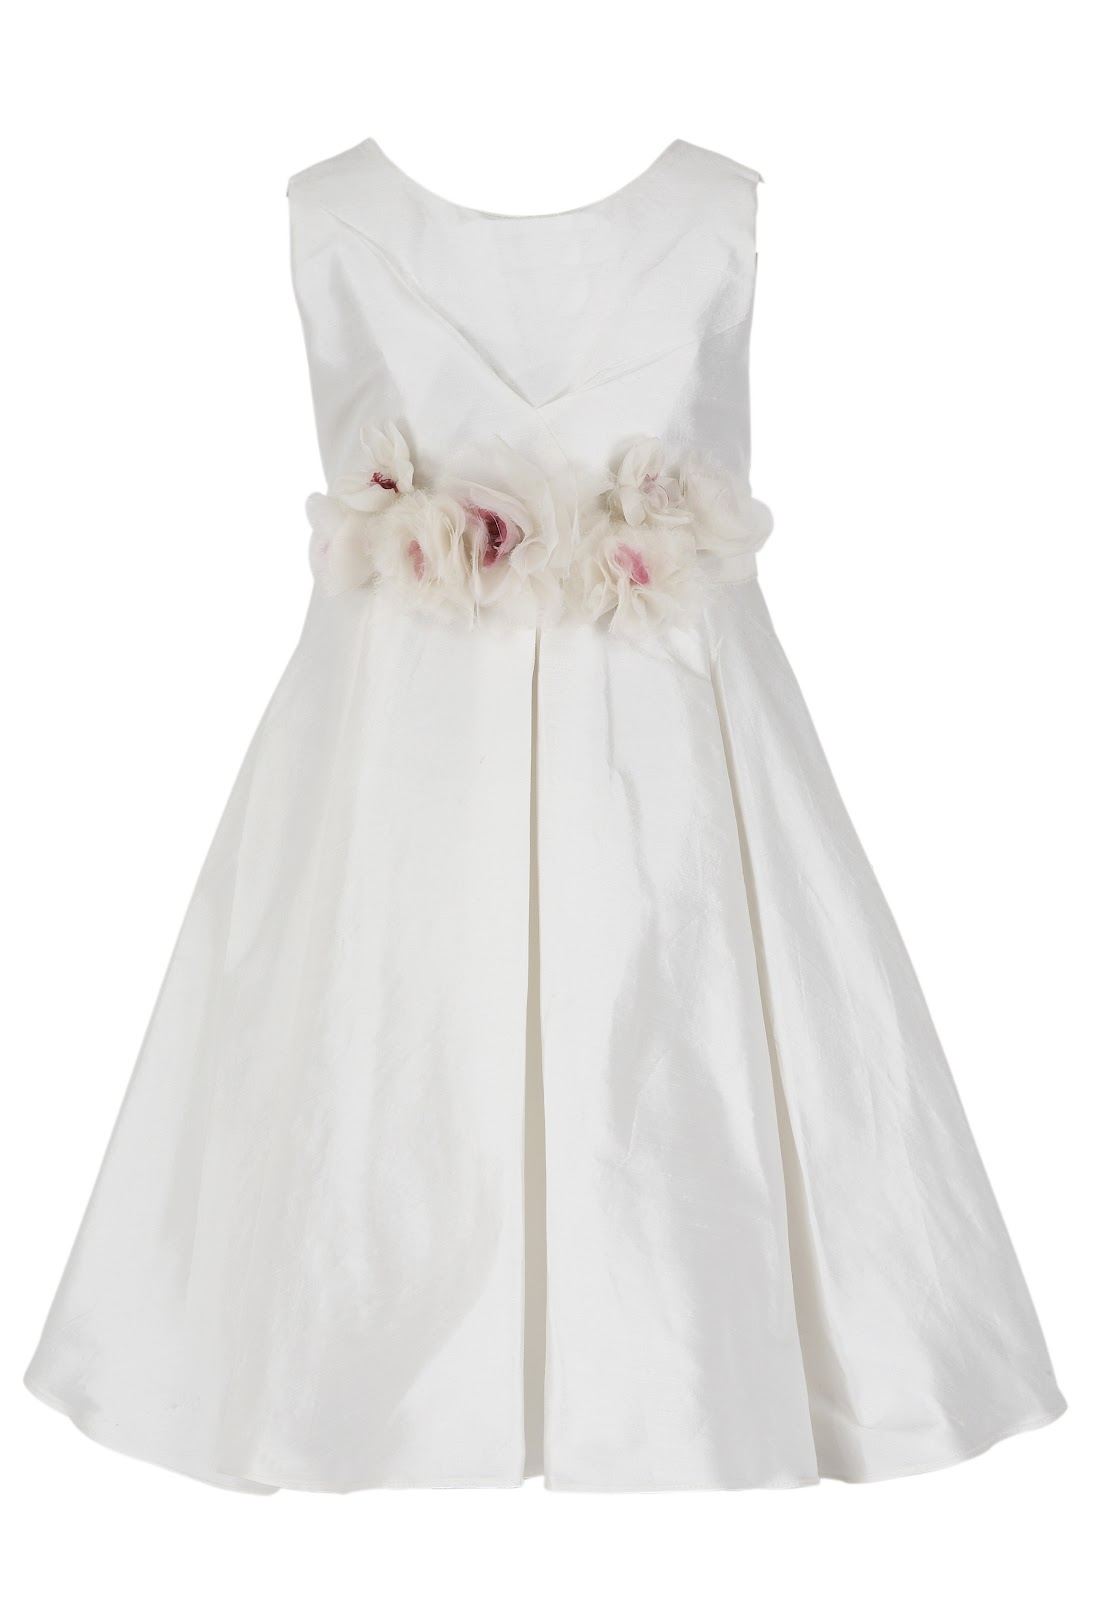 835b06f92097 Monsoon bridal for little girls | Marilena Theodorakou